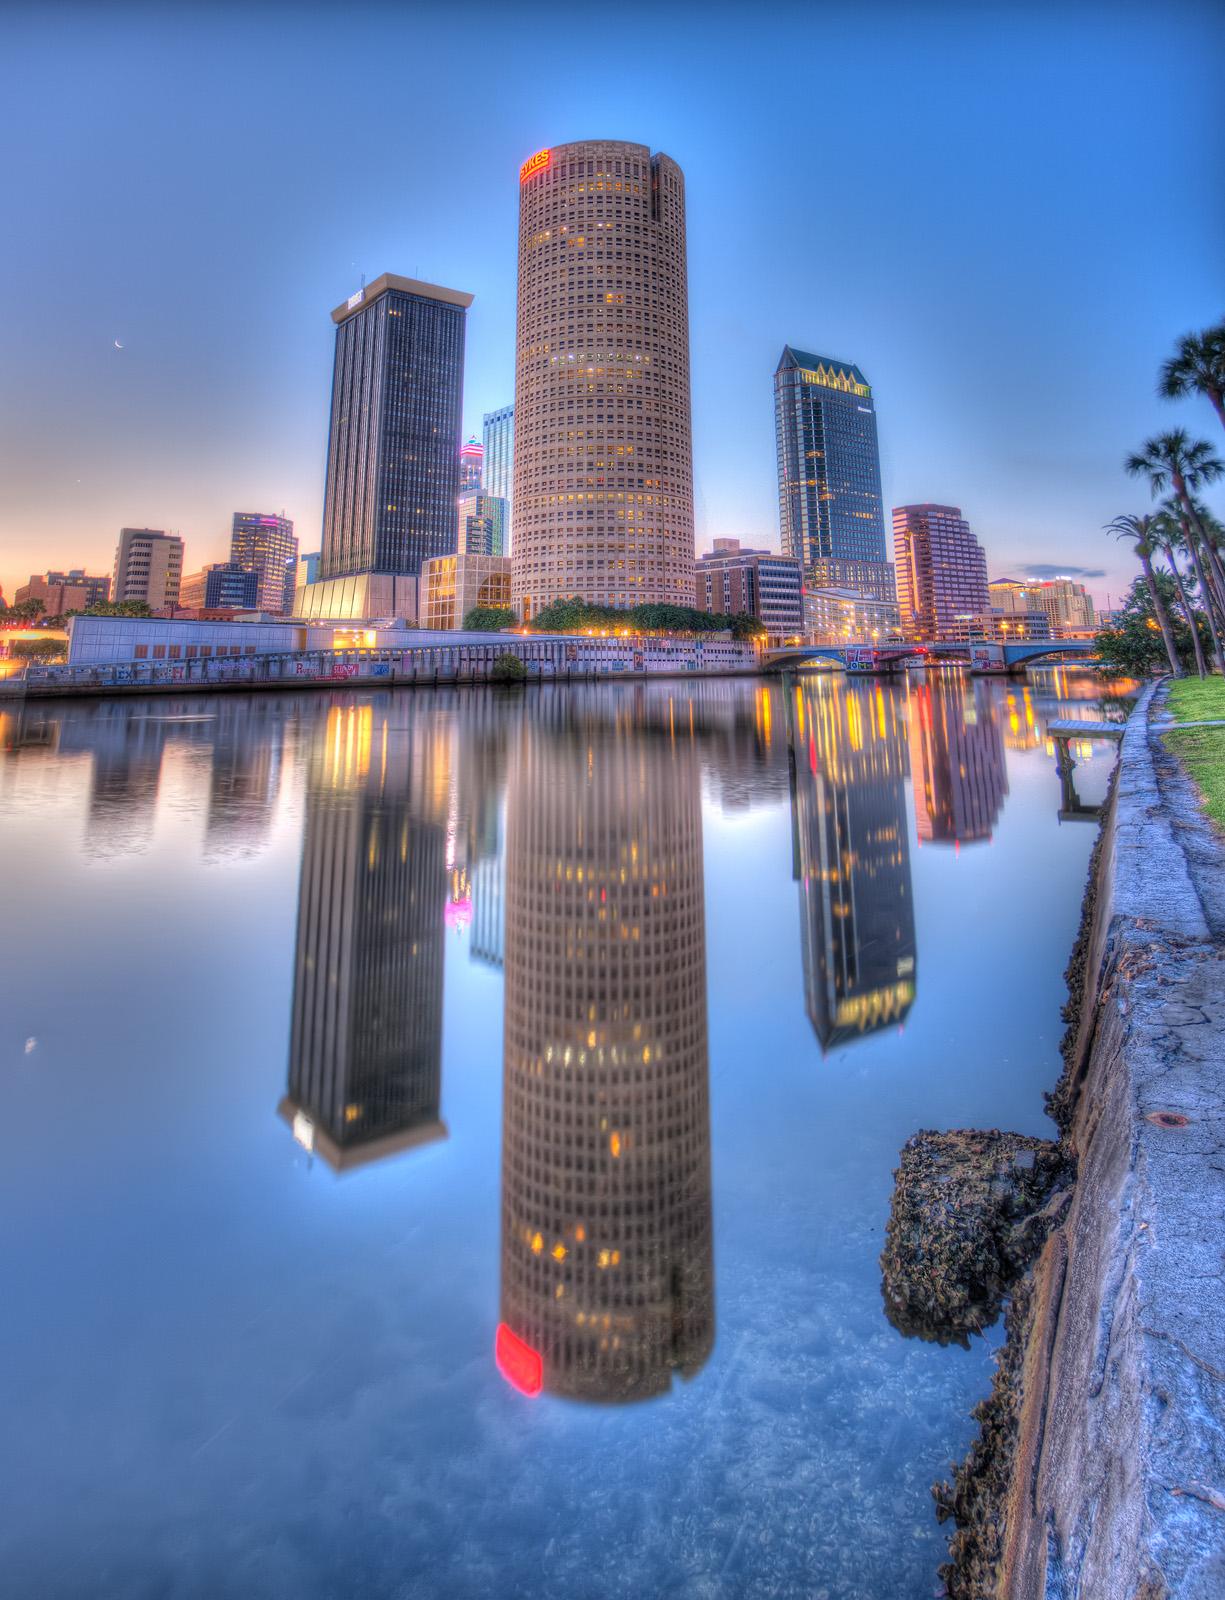 Tampa Reflection and Seawall